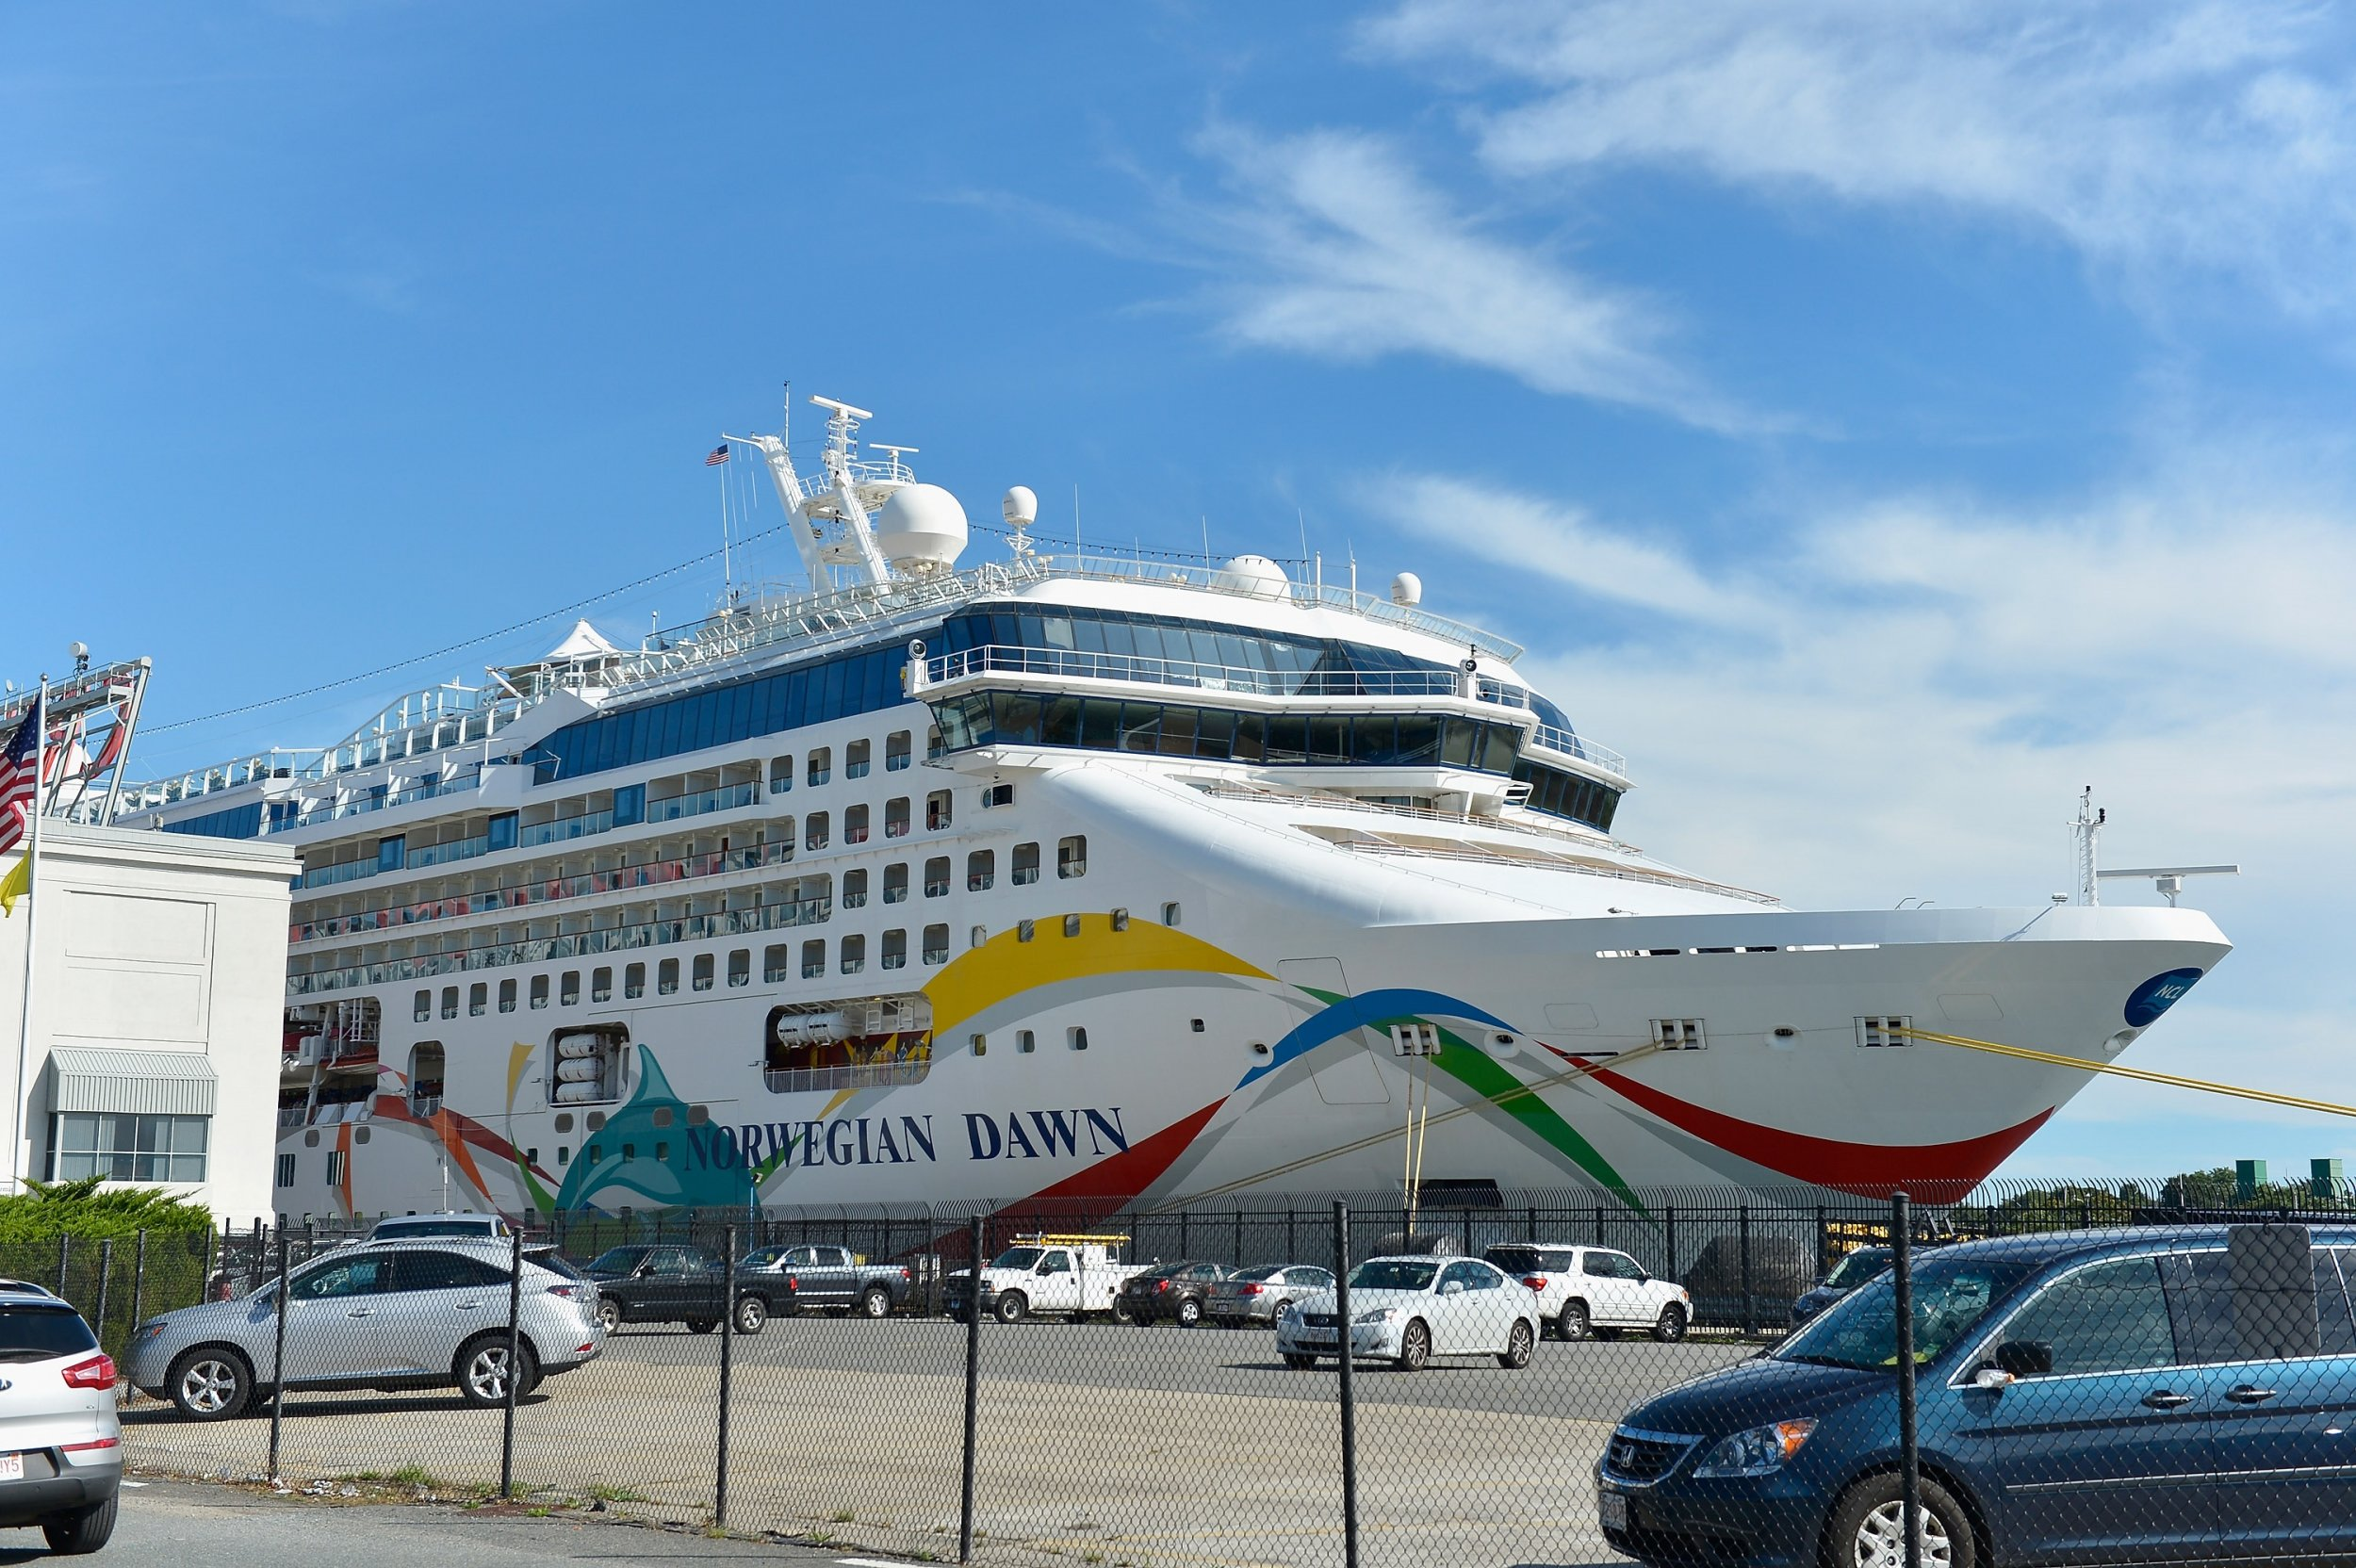 Norwegian Dawn cruise ship rape